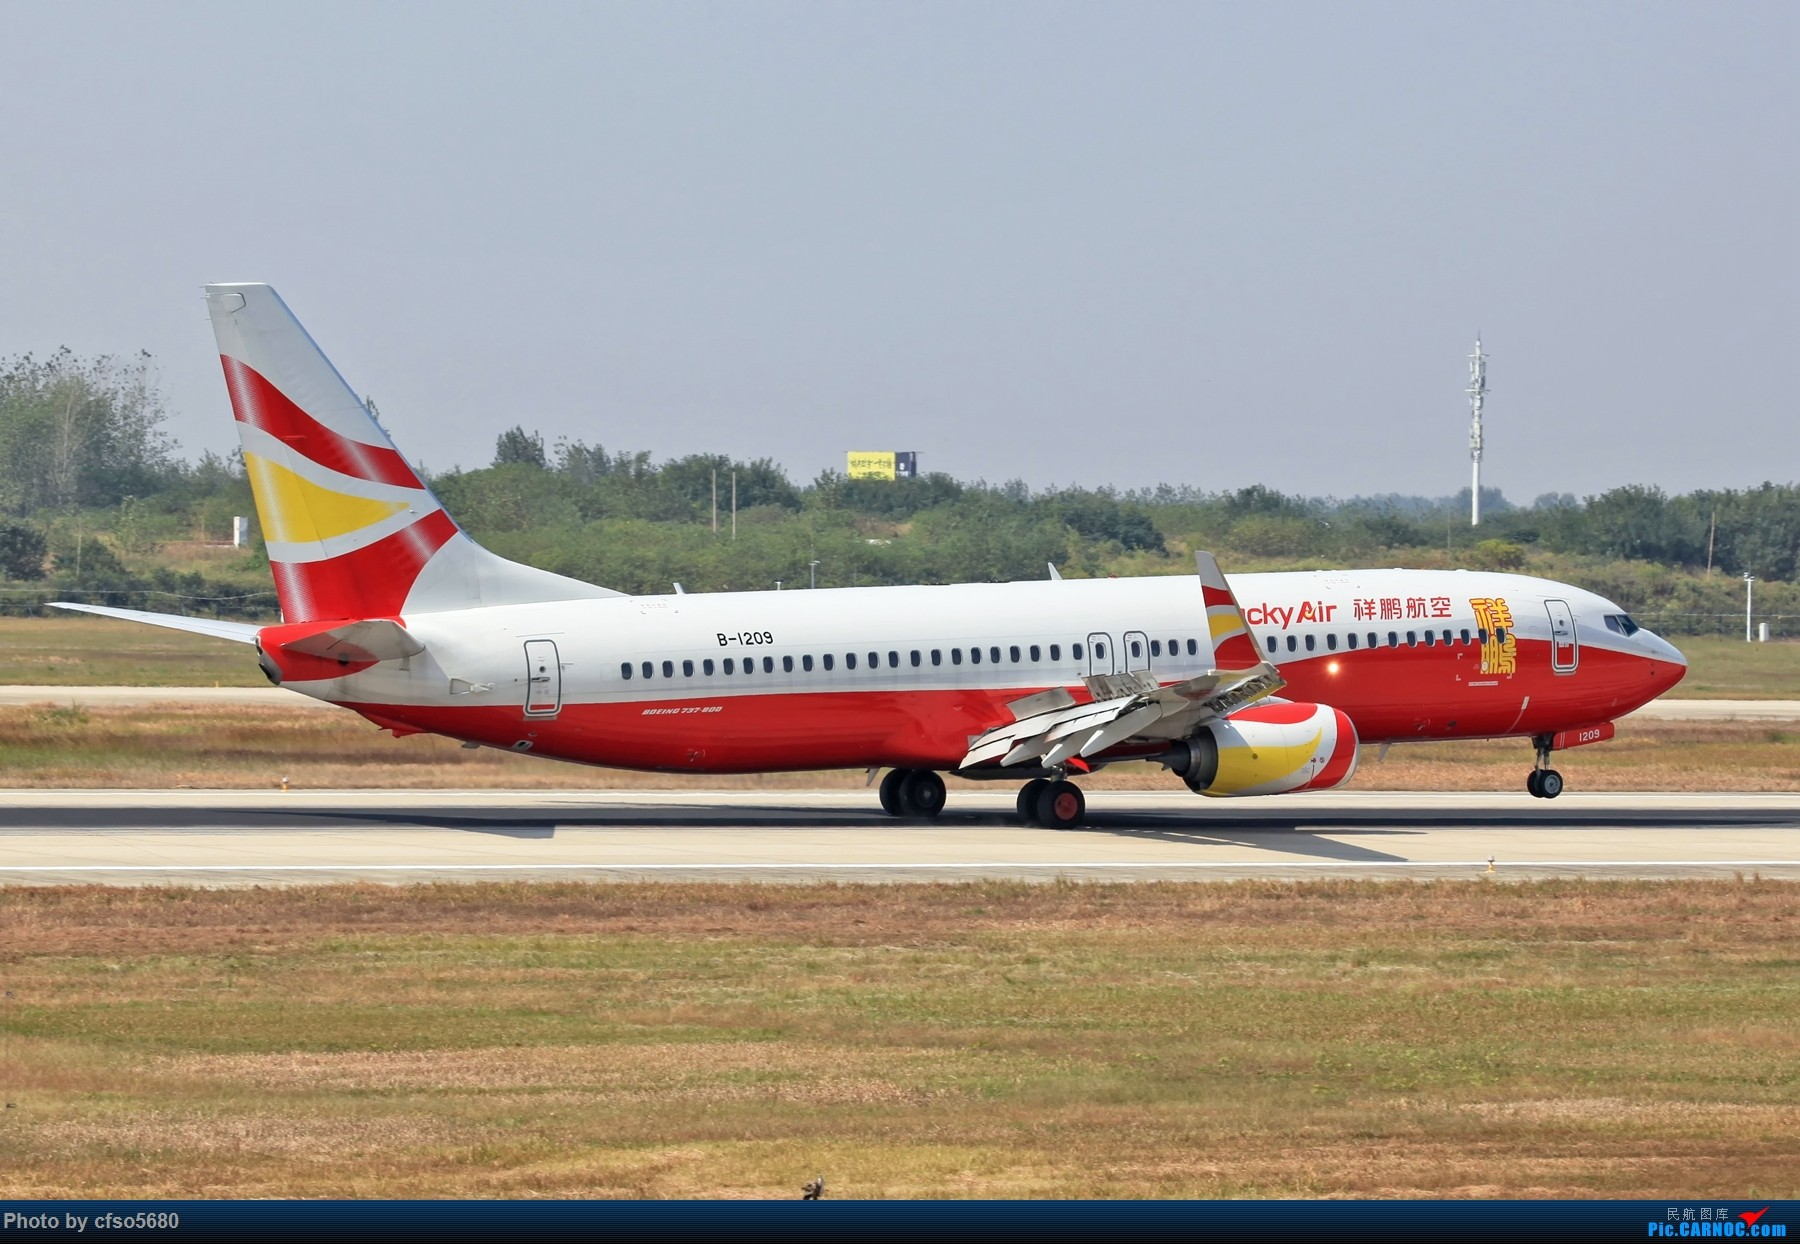 Re:[原创]国庆假期合肥新桥机场拍机活动 BOEING 737-800 B-1209 中国合肥新桥国际机场